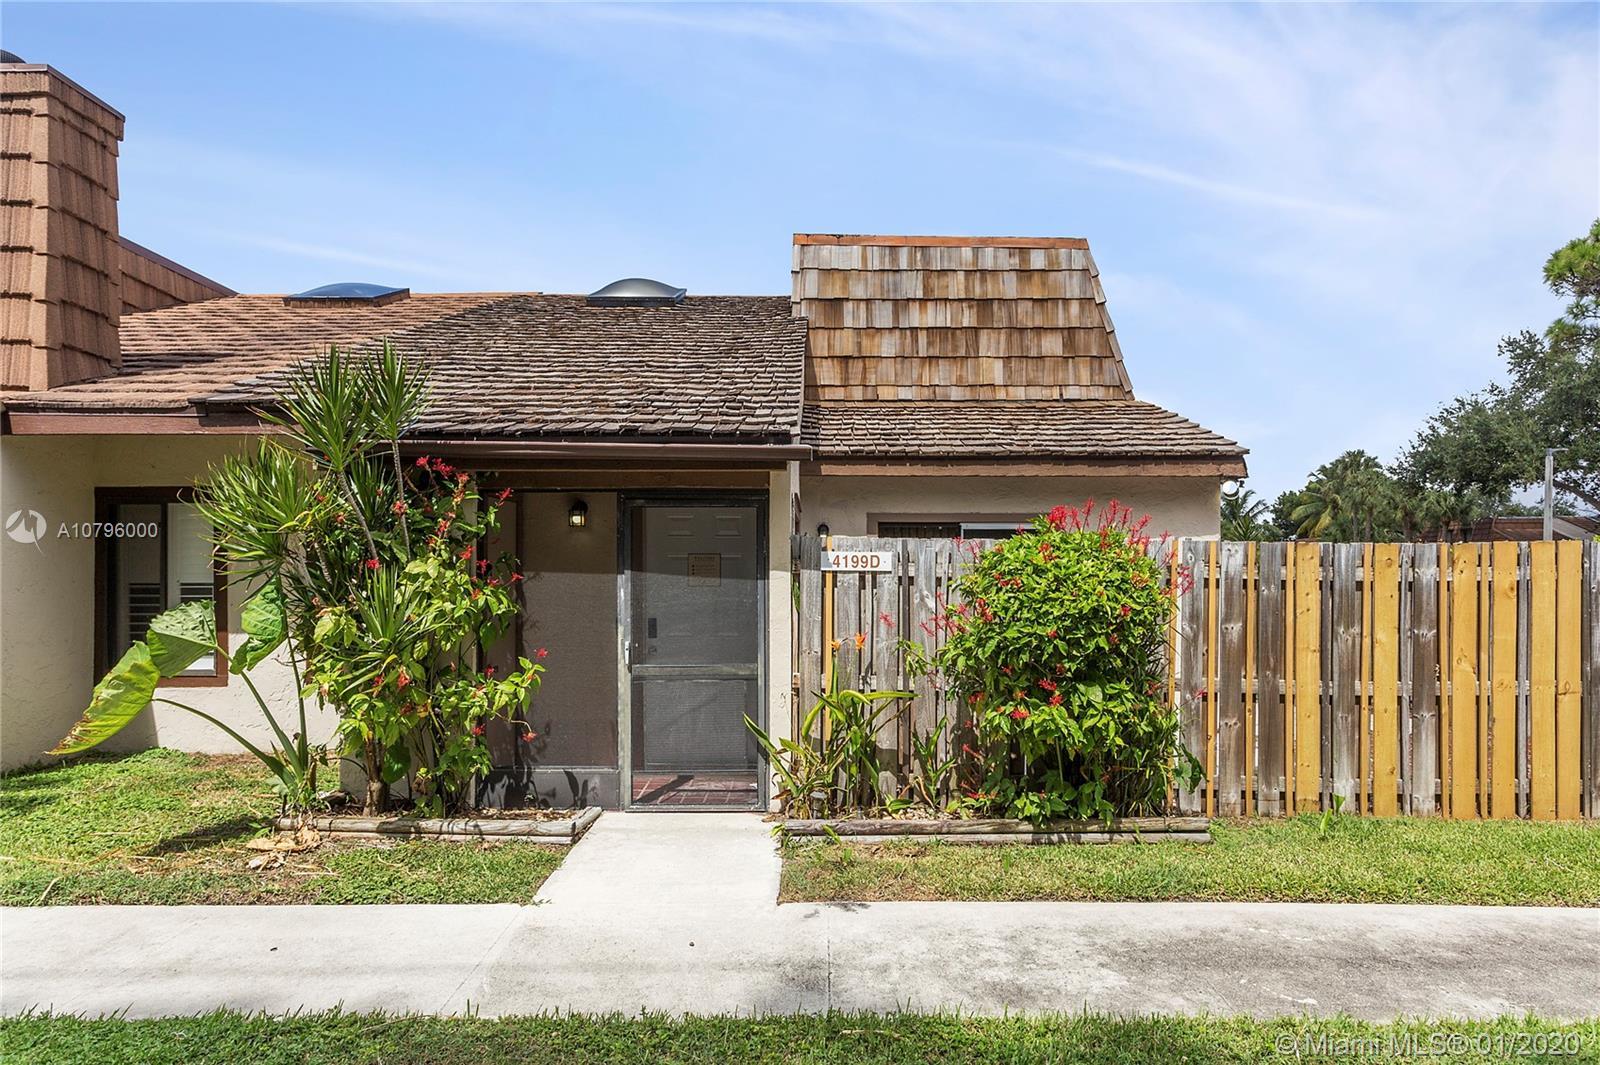 , West Palm Beach, FL 33406